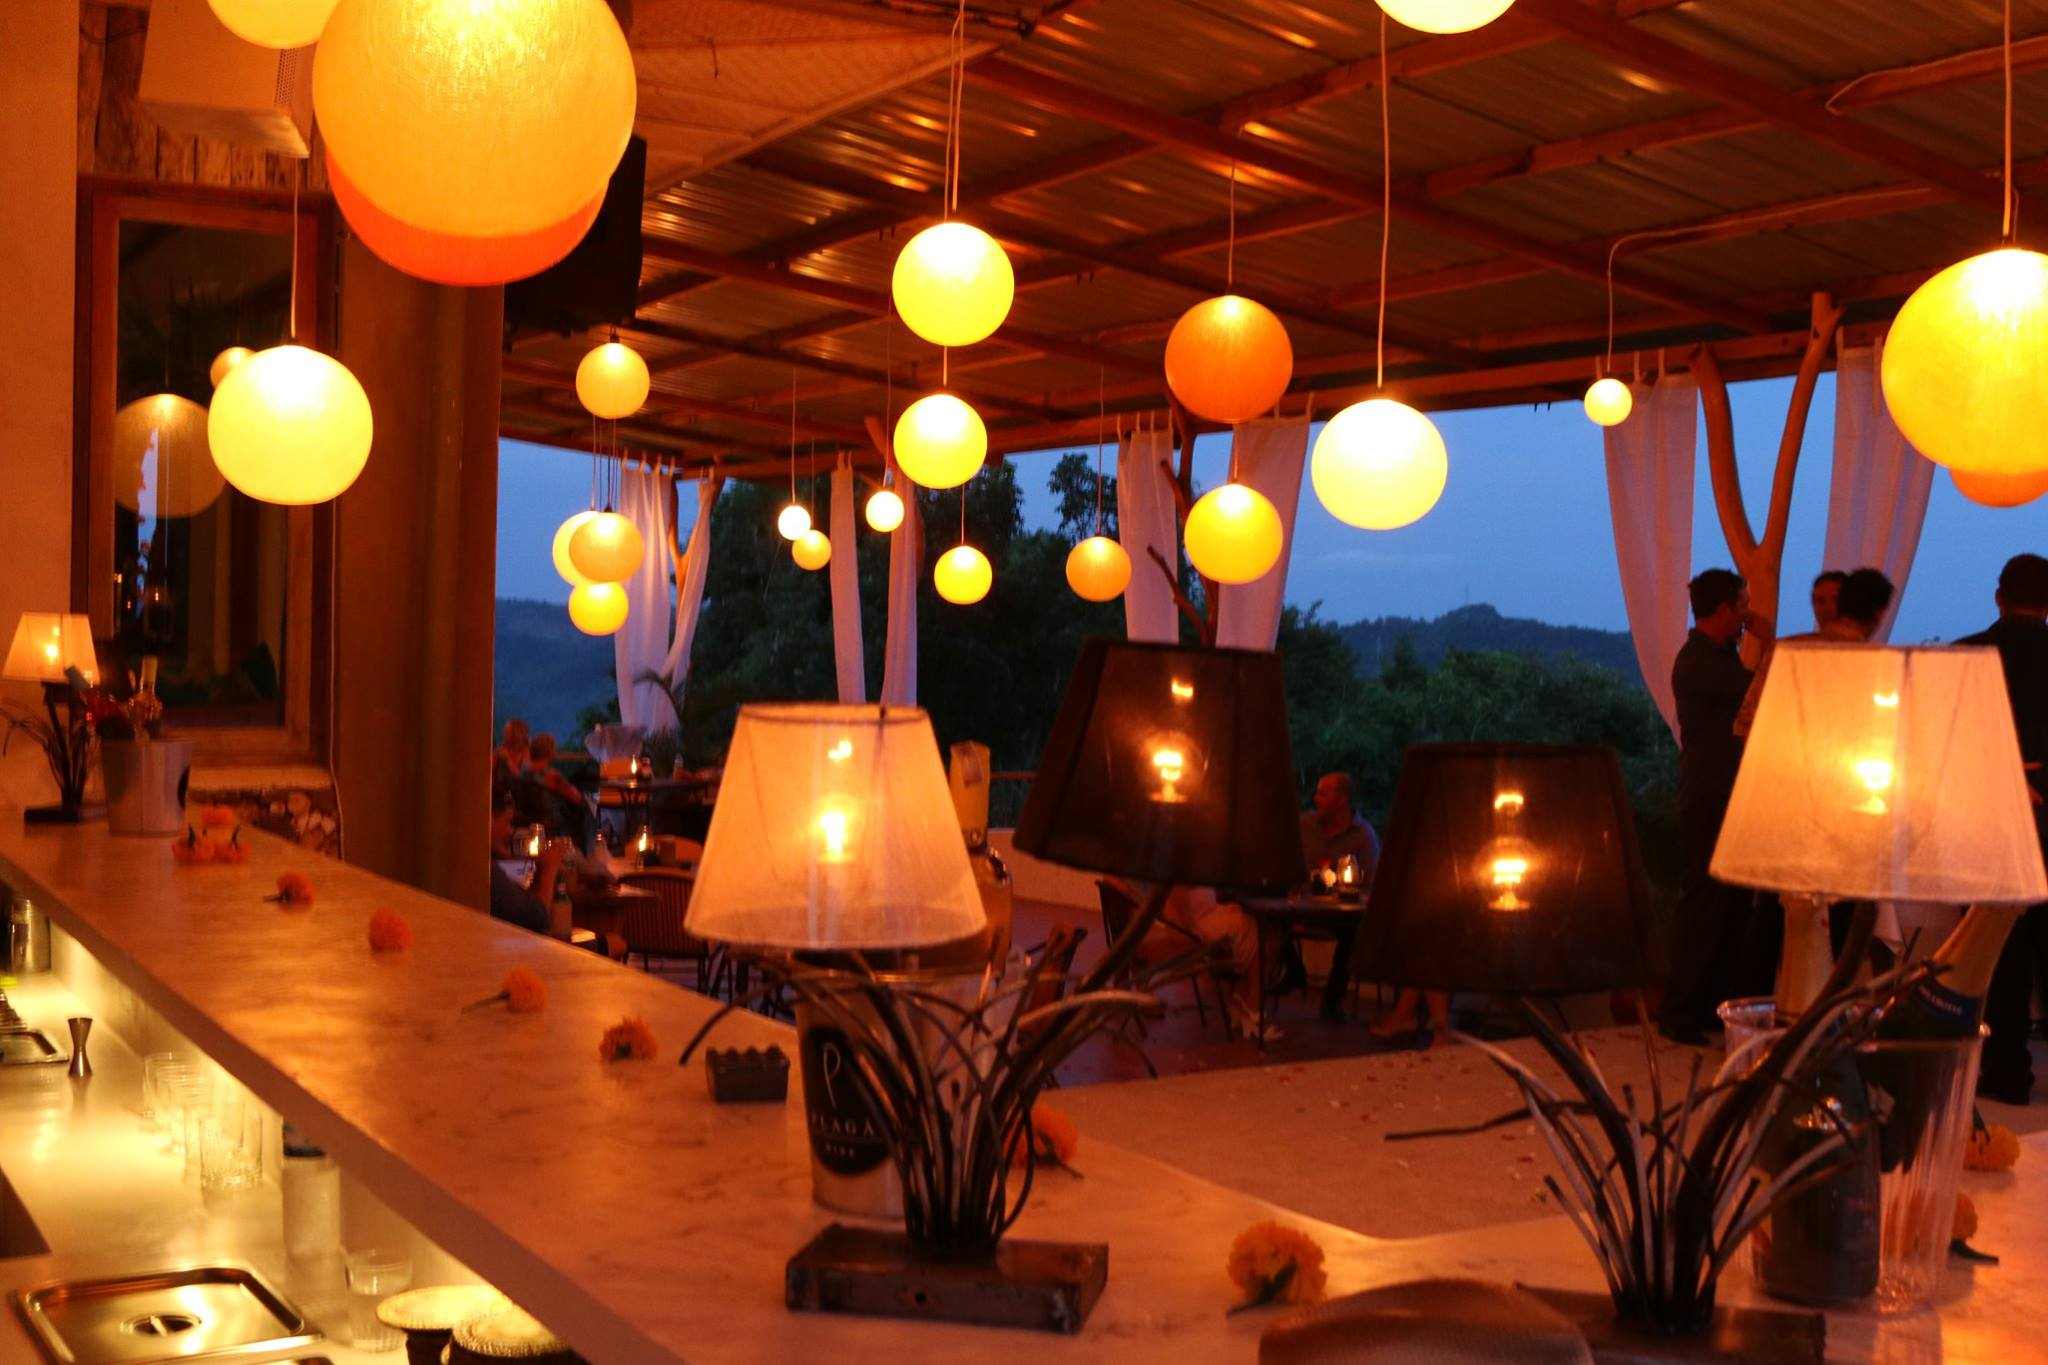 ashtari-restaurant-and-yoga-shala-indonesia-7